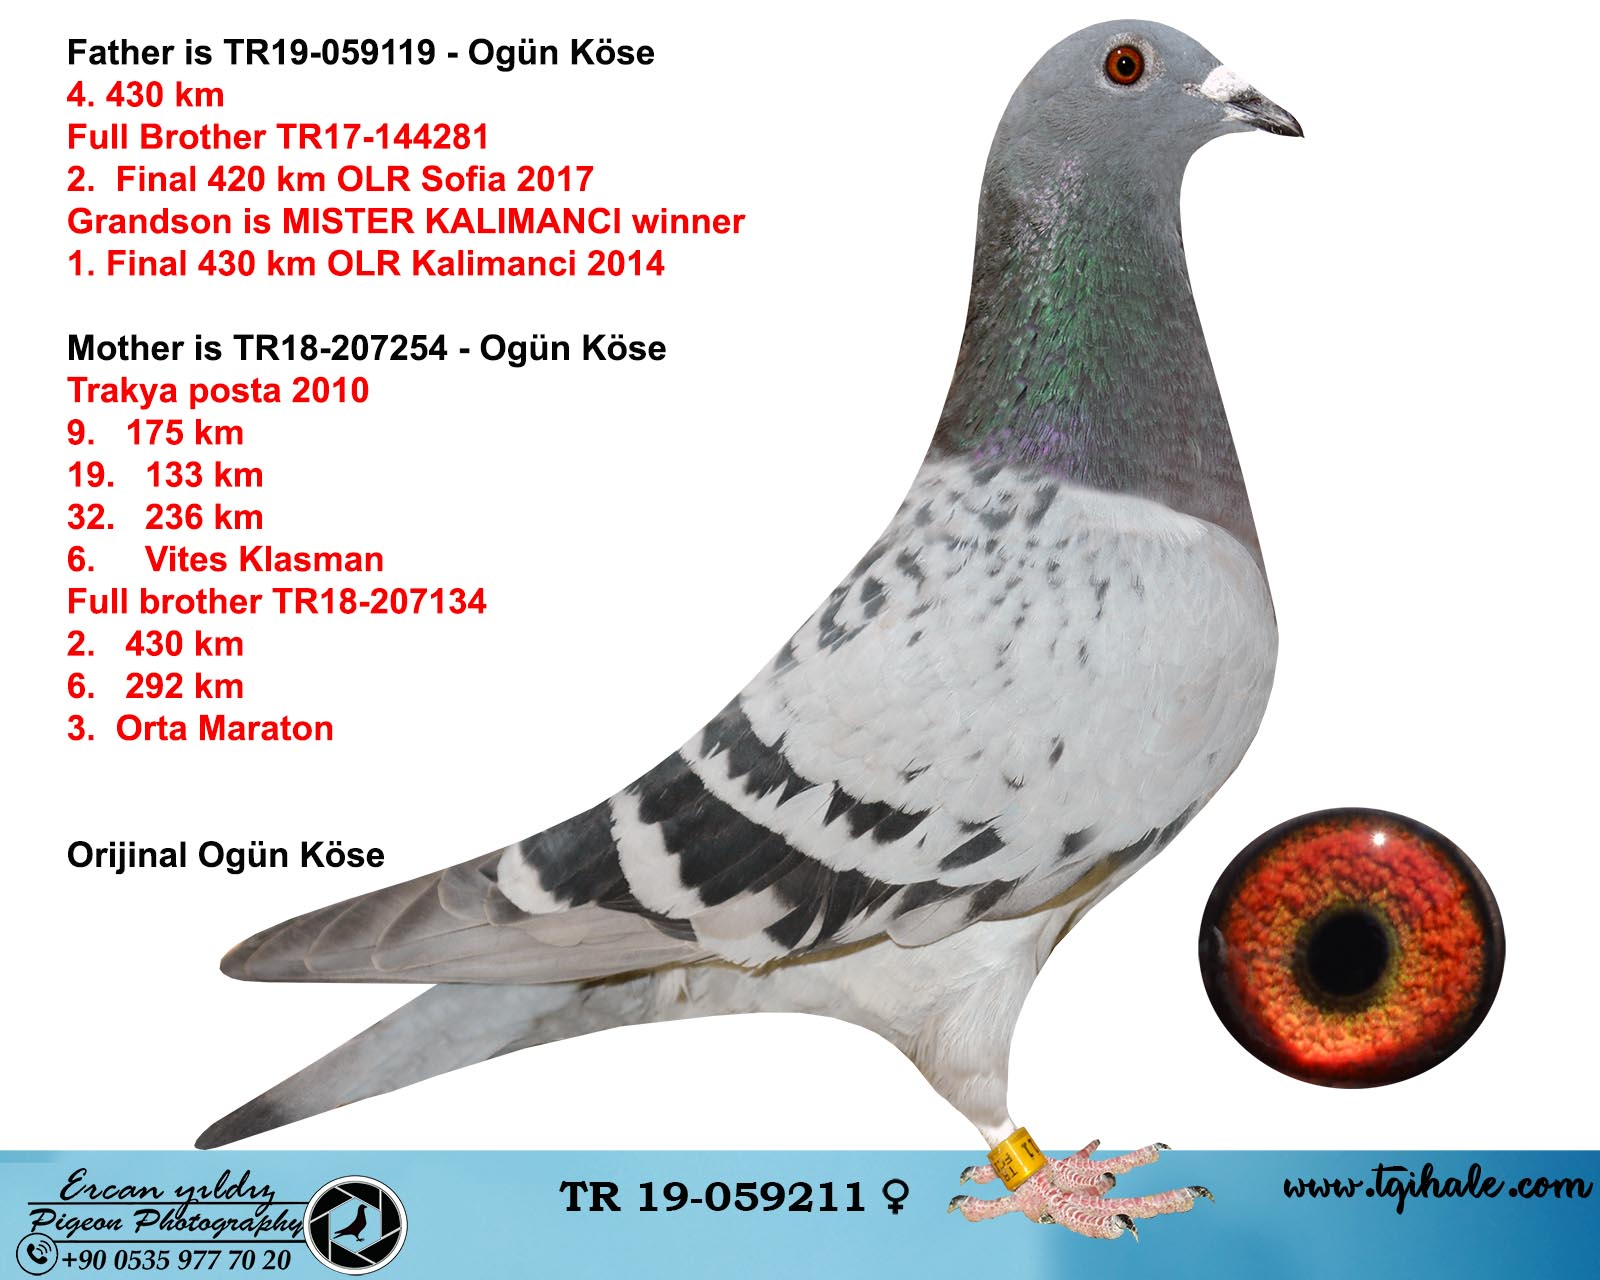 TR19-059211 DİŞİ / BABASI 4.  430 KM  FULL BROTHER MISTER KALIMACI